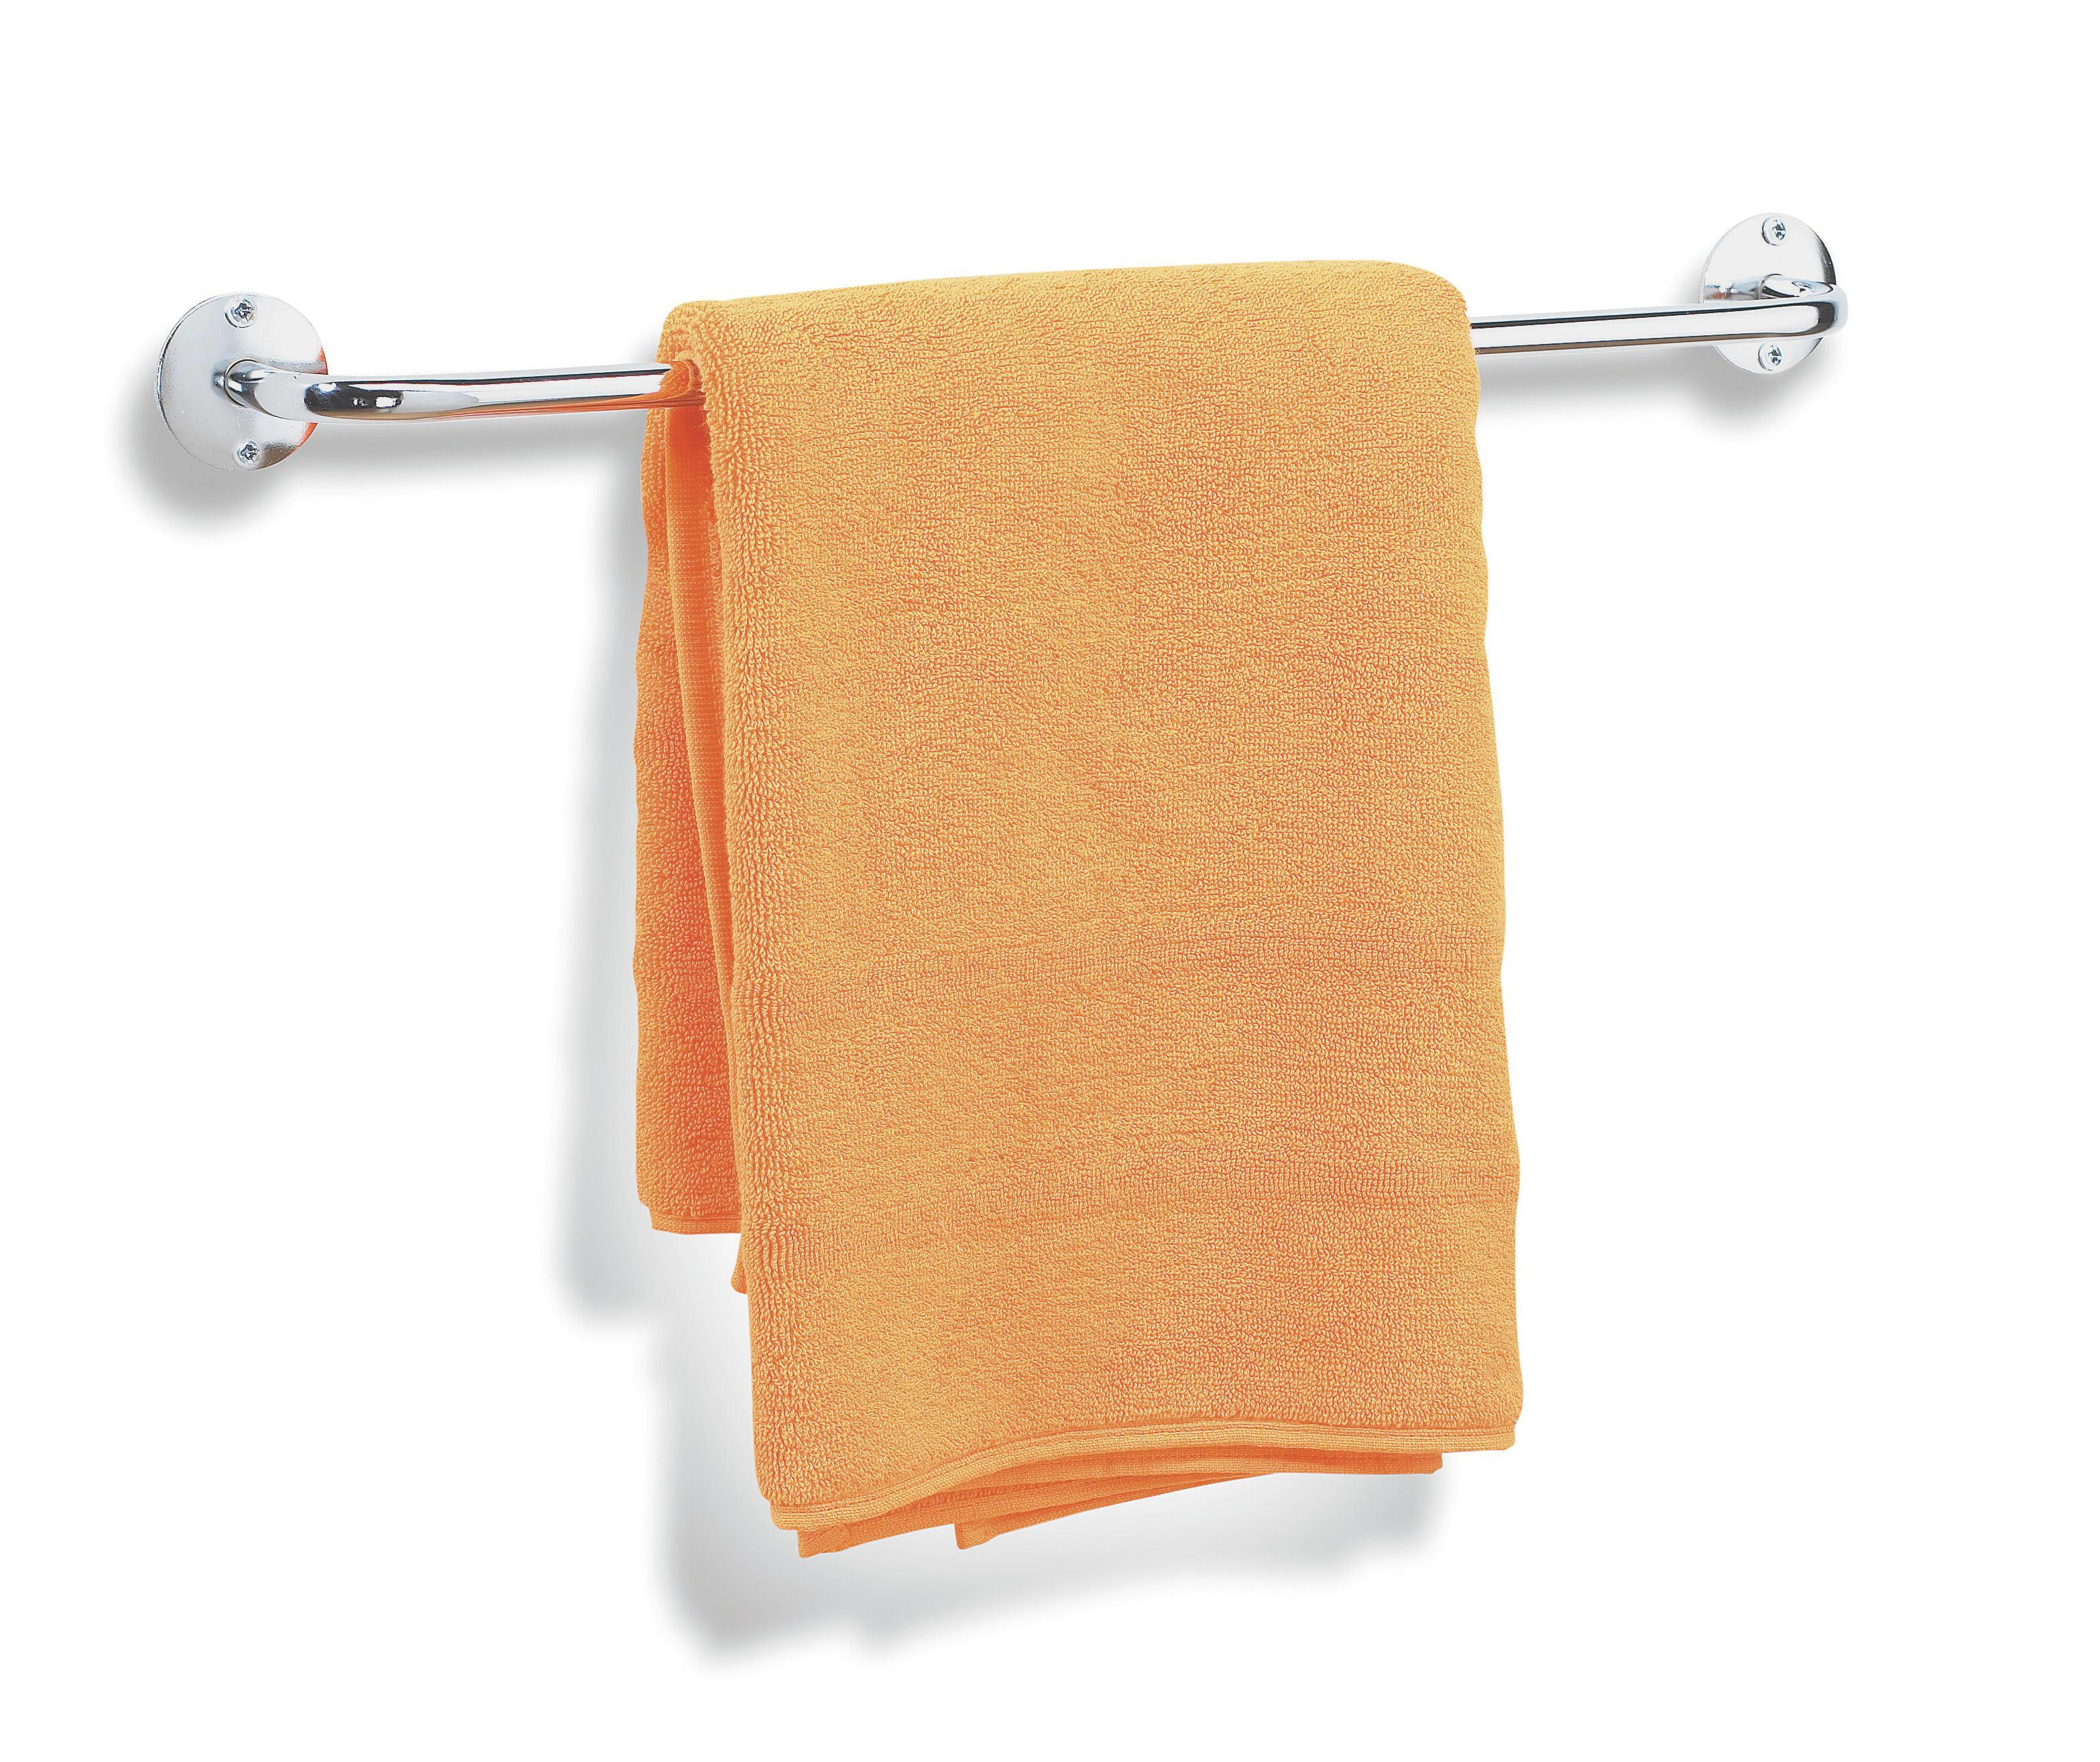 Handtuchhalter in Chromfarben - Chromfarben, Metall (55/5/6,5 CMcm) - MÖMAX modern living